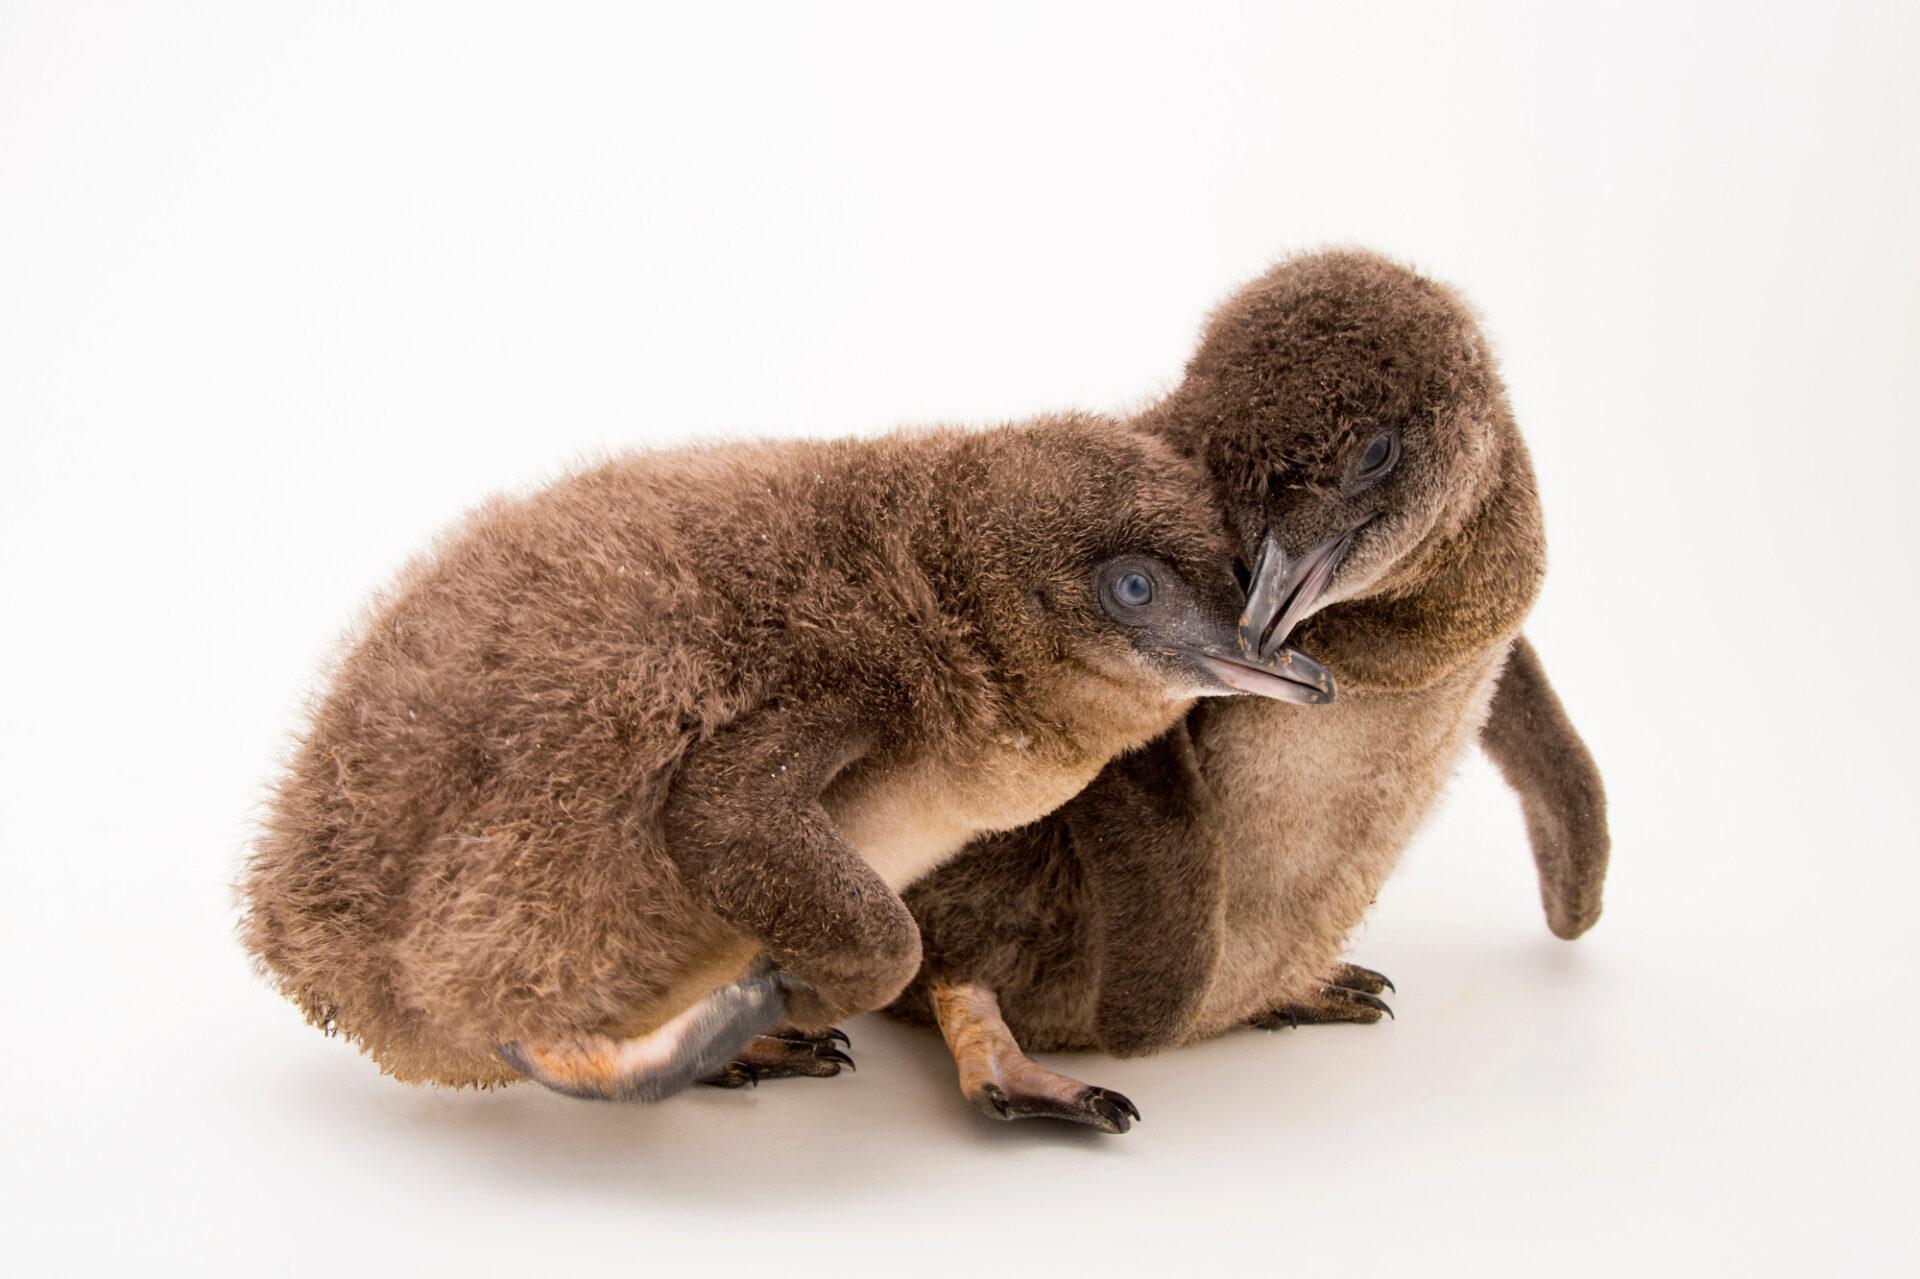 Picture of baby little blue penguins (Eudyptula minor) at the Cincinnati Zoo.